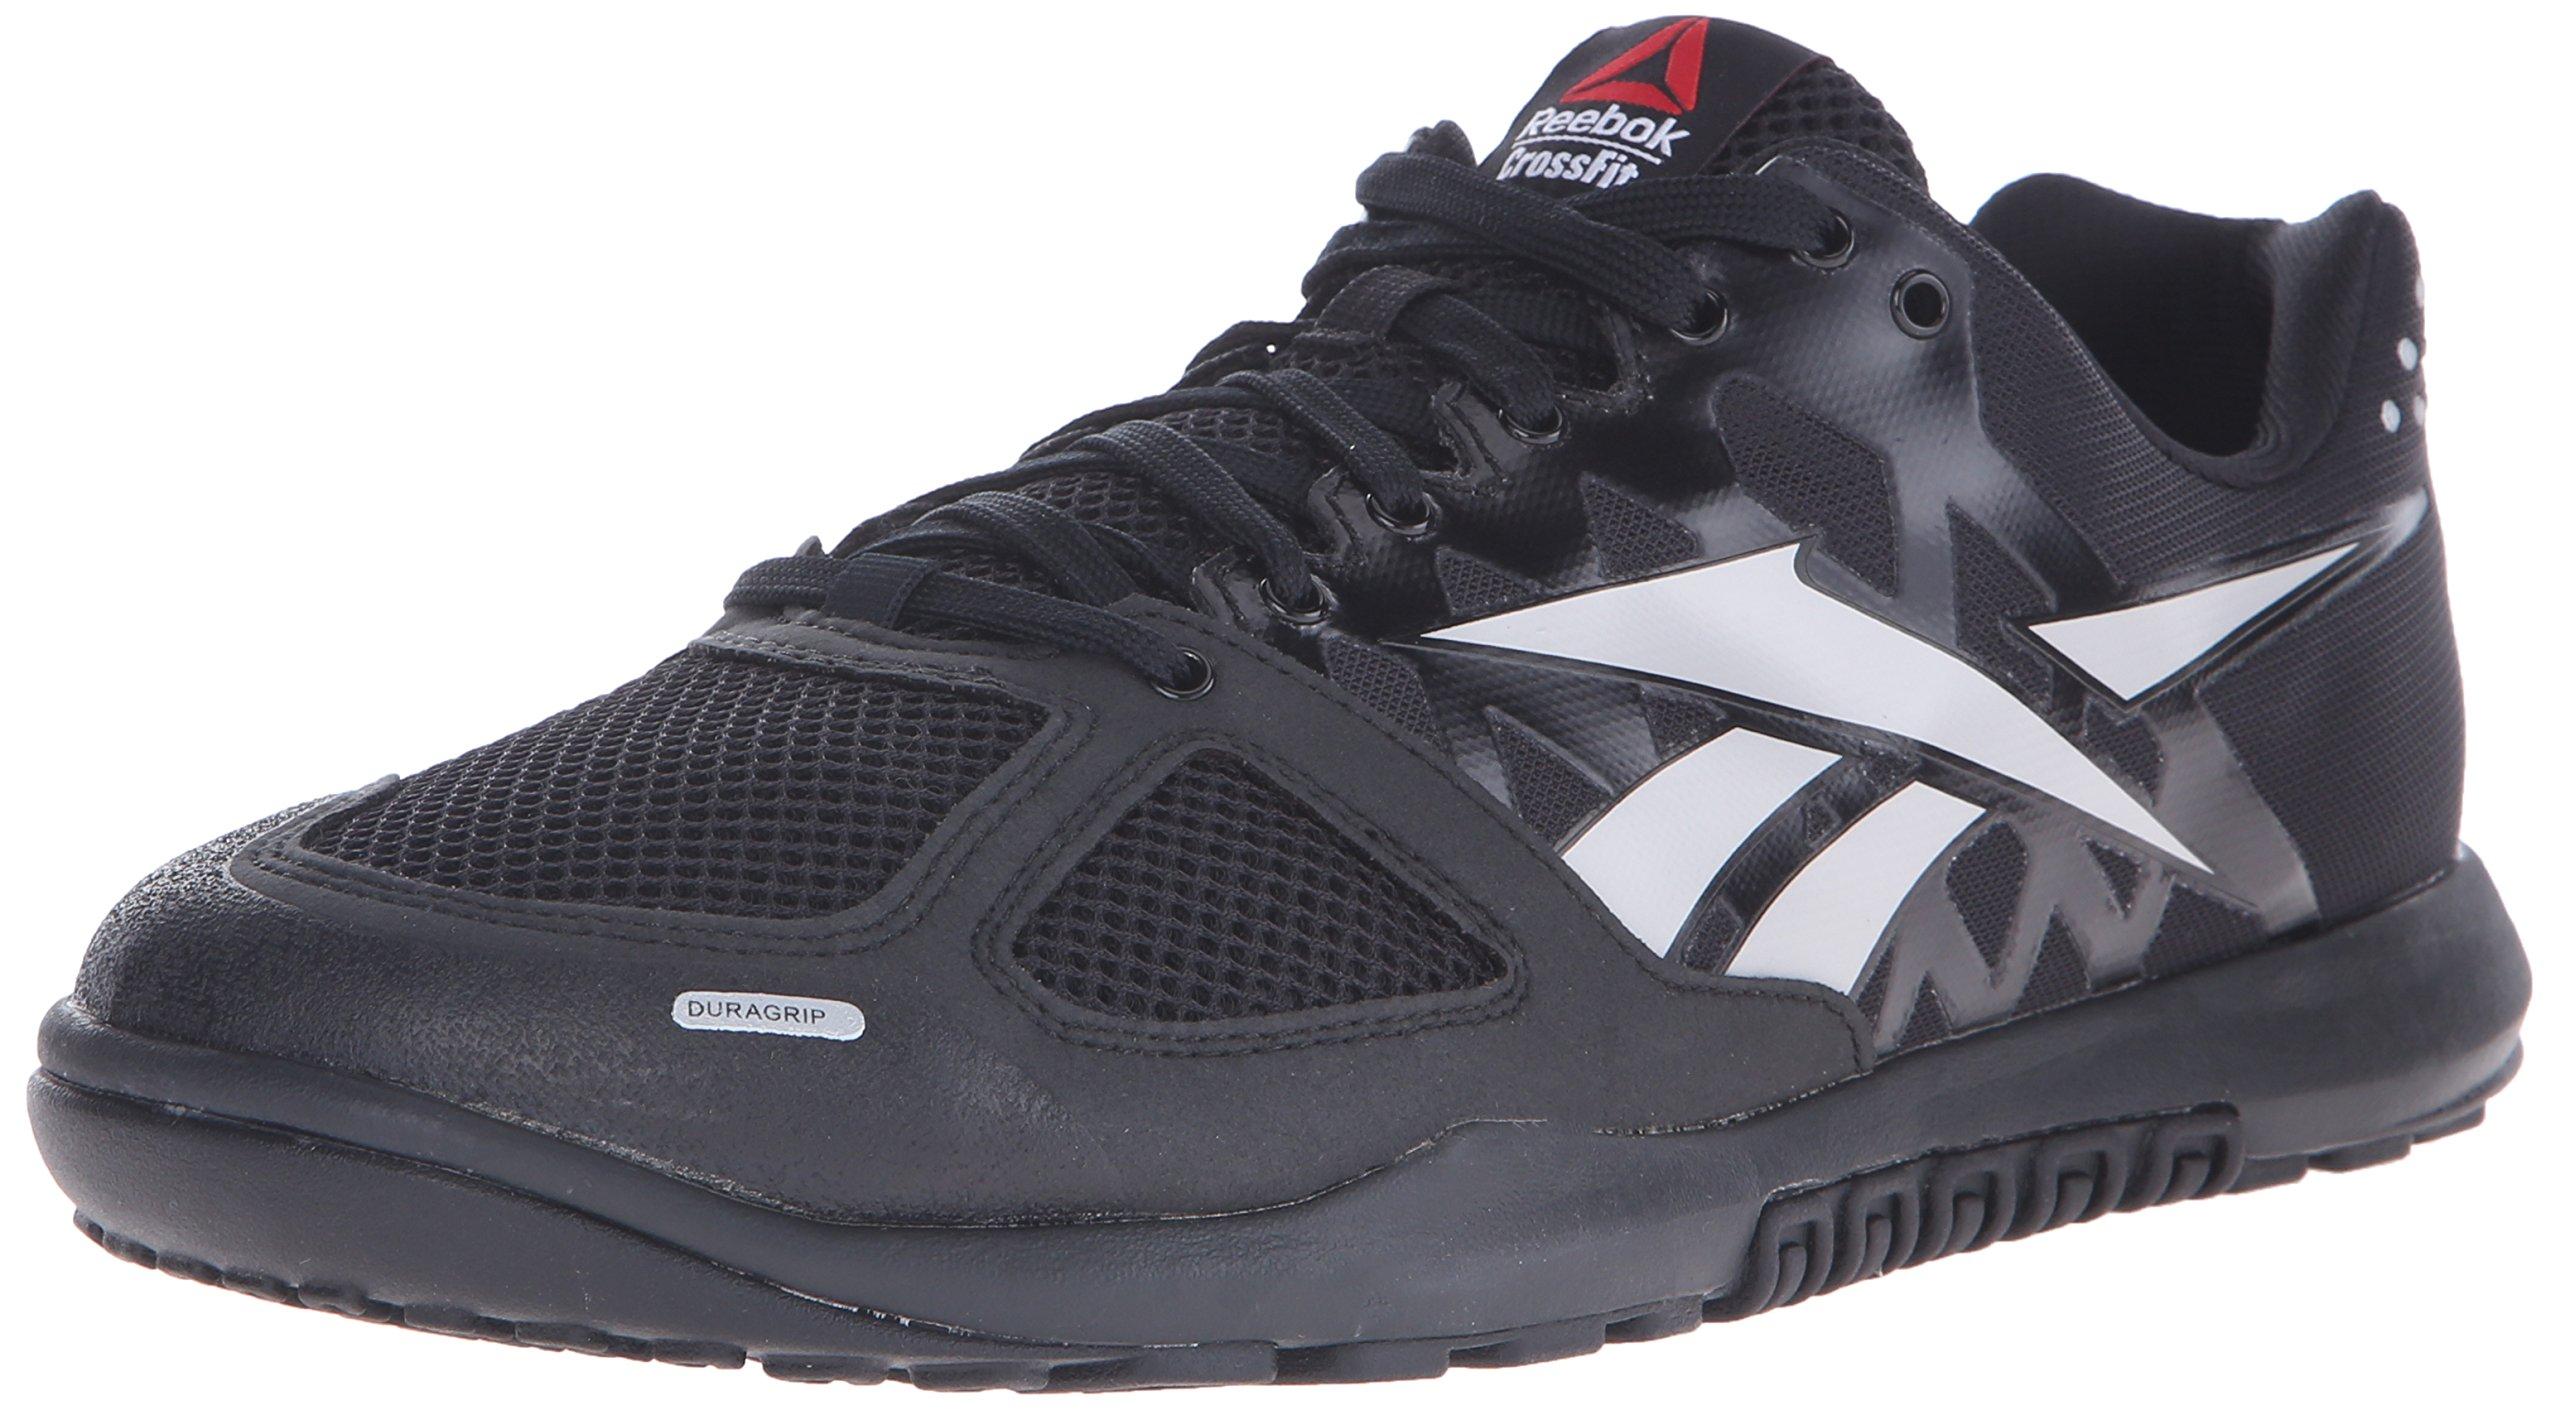 Reebok Men's Crossfit Nano 2.0 Training Shoe, Black/Zinc Grey, 10.5 M US